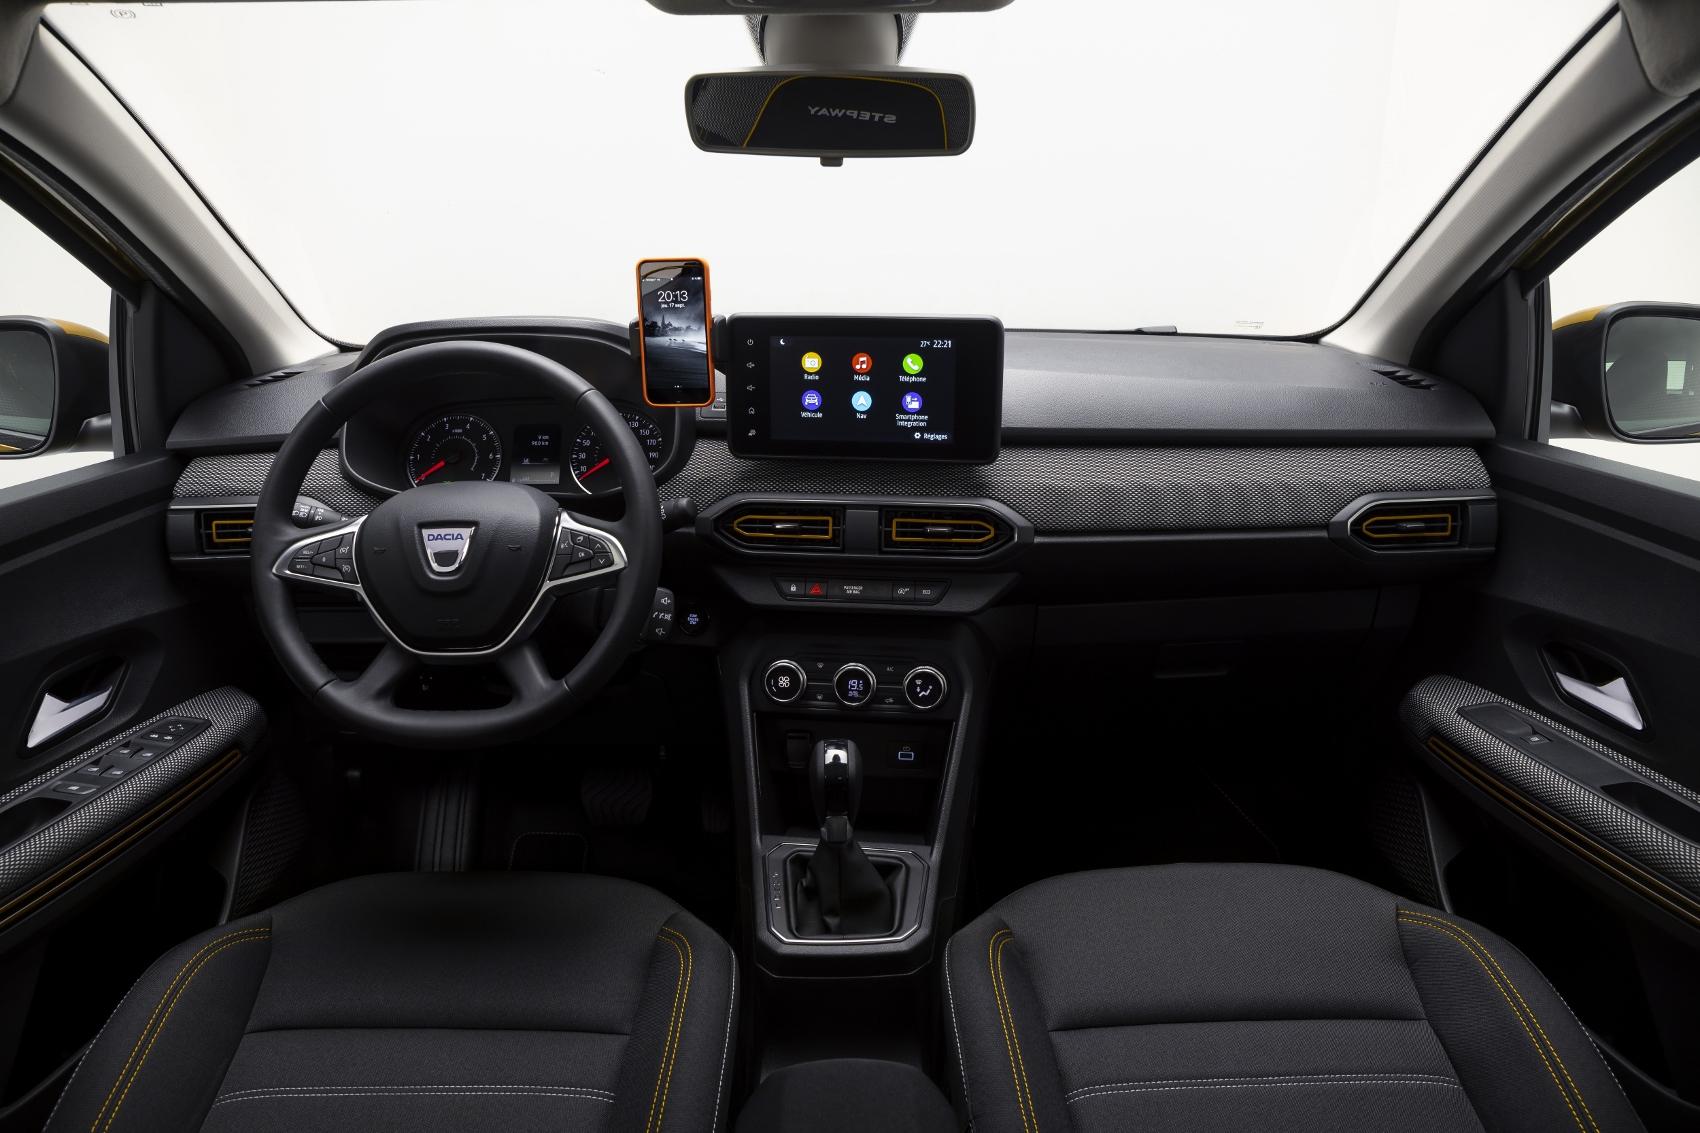 2020 - New Dacia SANDERO STEPWAY (7) (1700x1133)